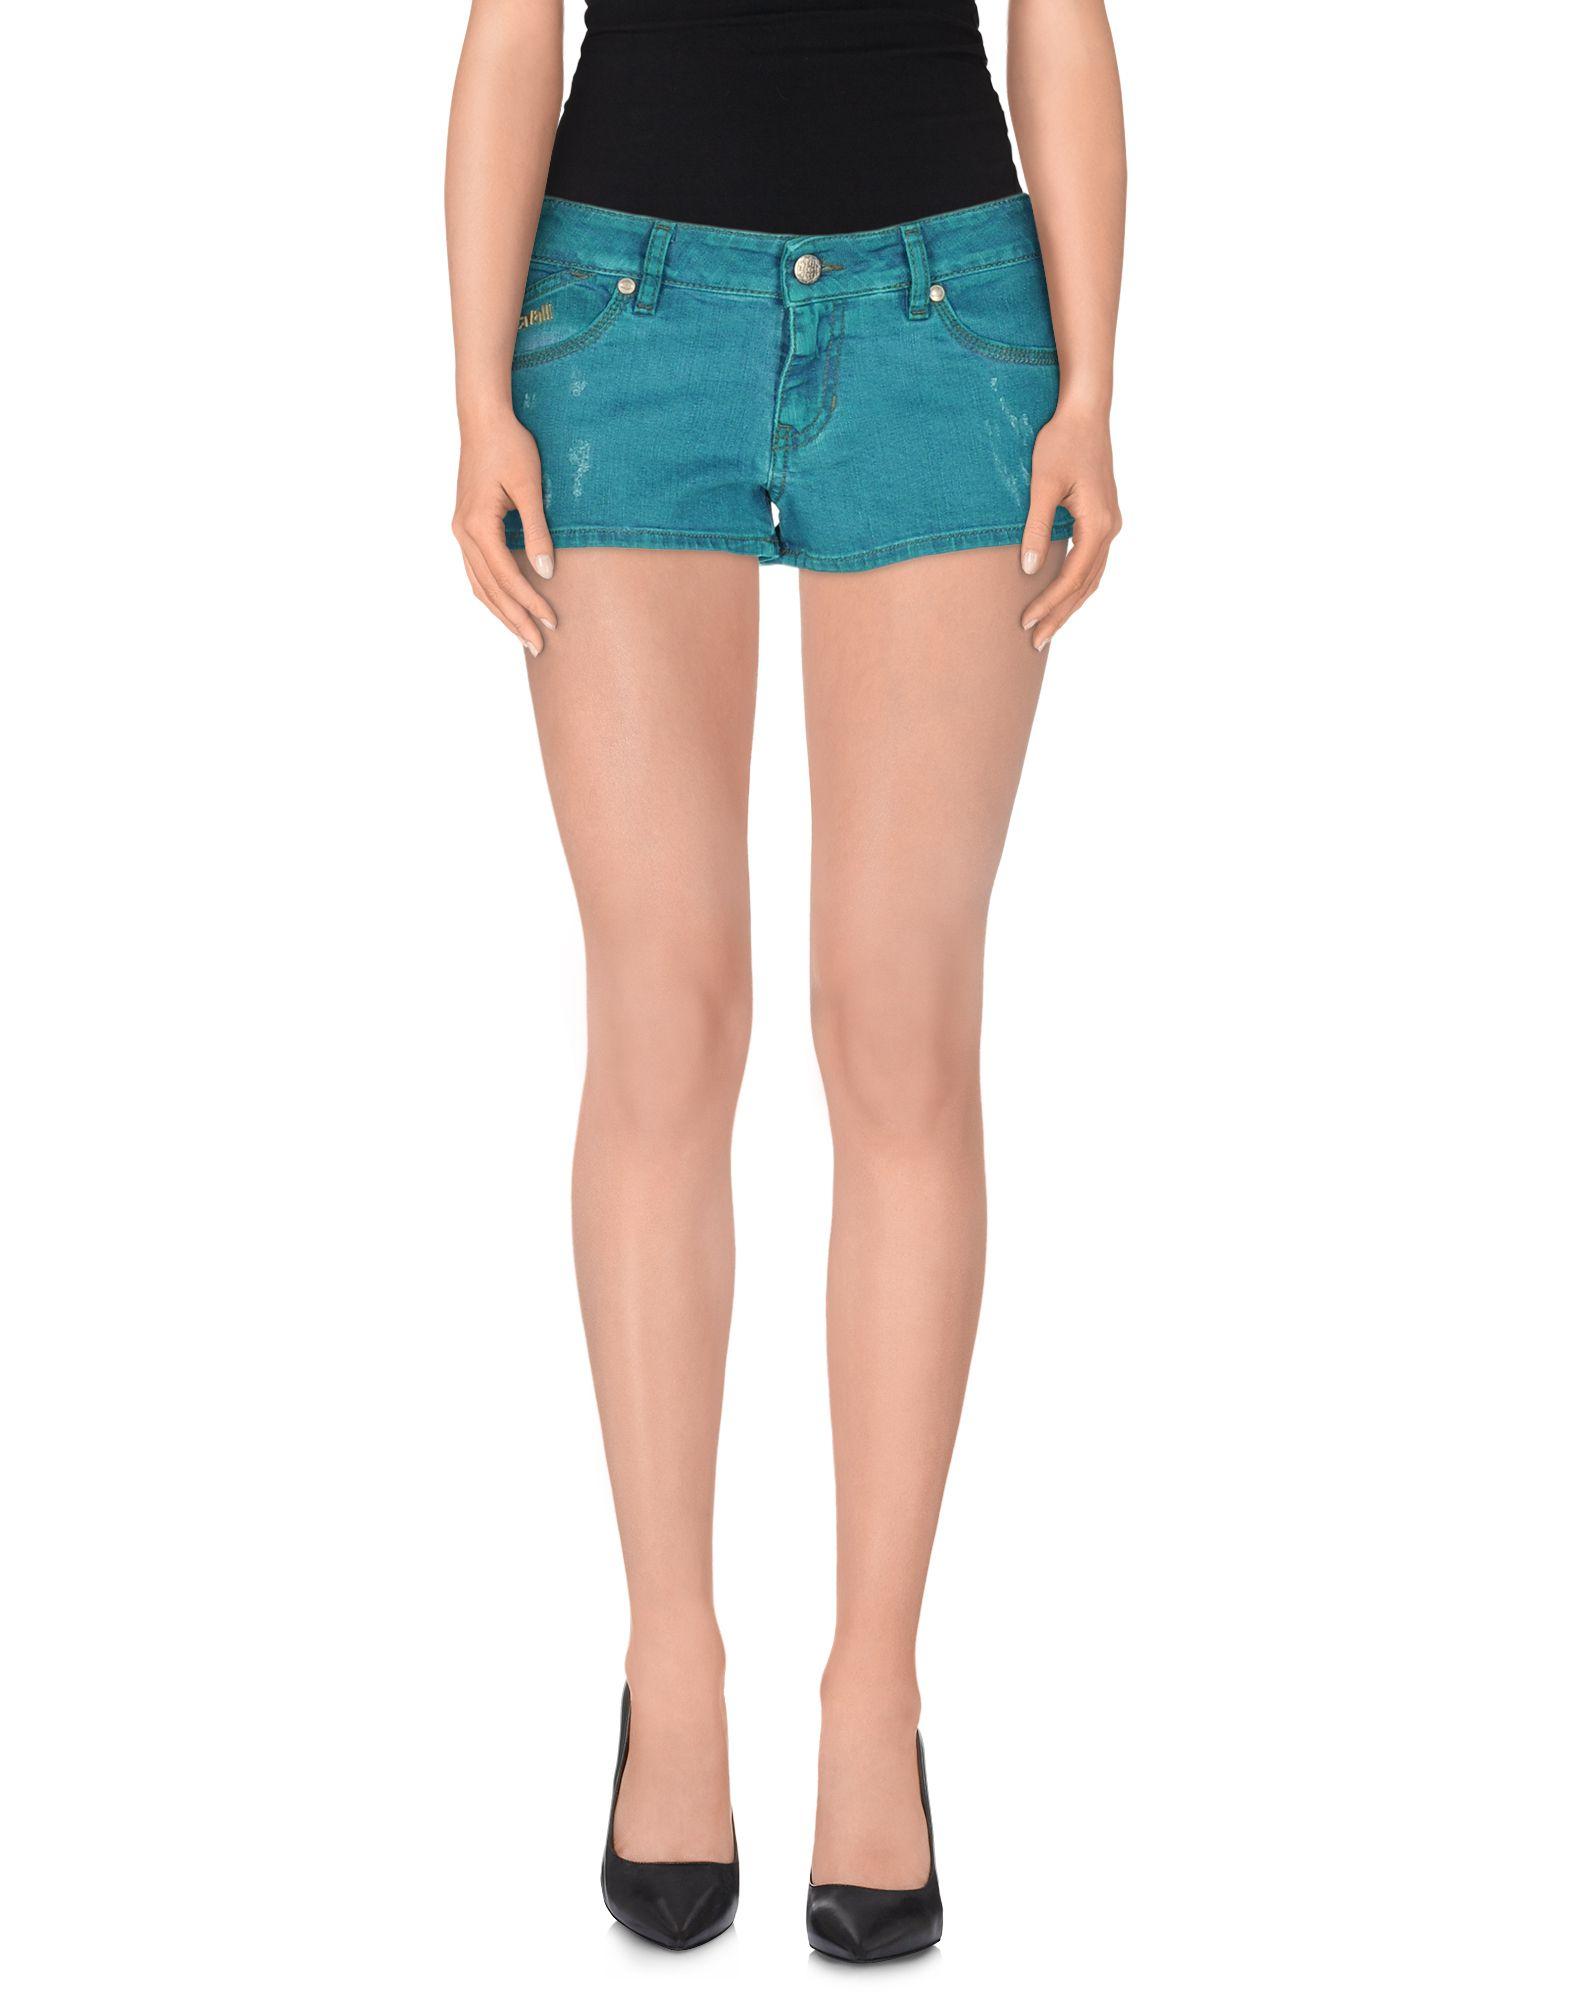 JUST CAVALLI Джинсовые шорты superfine джинсовые шорты